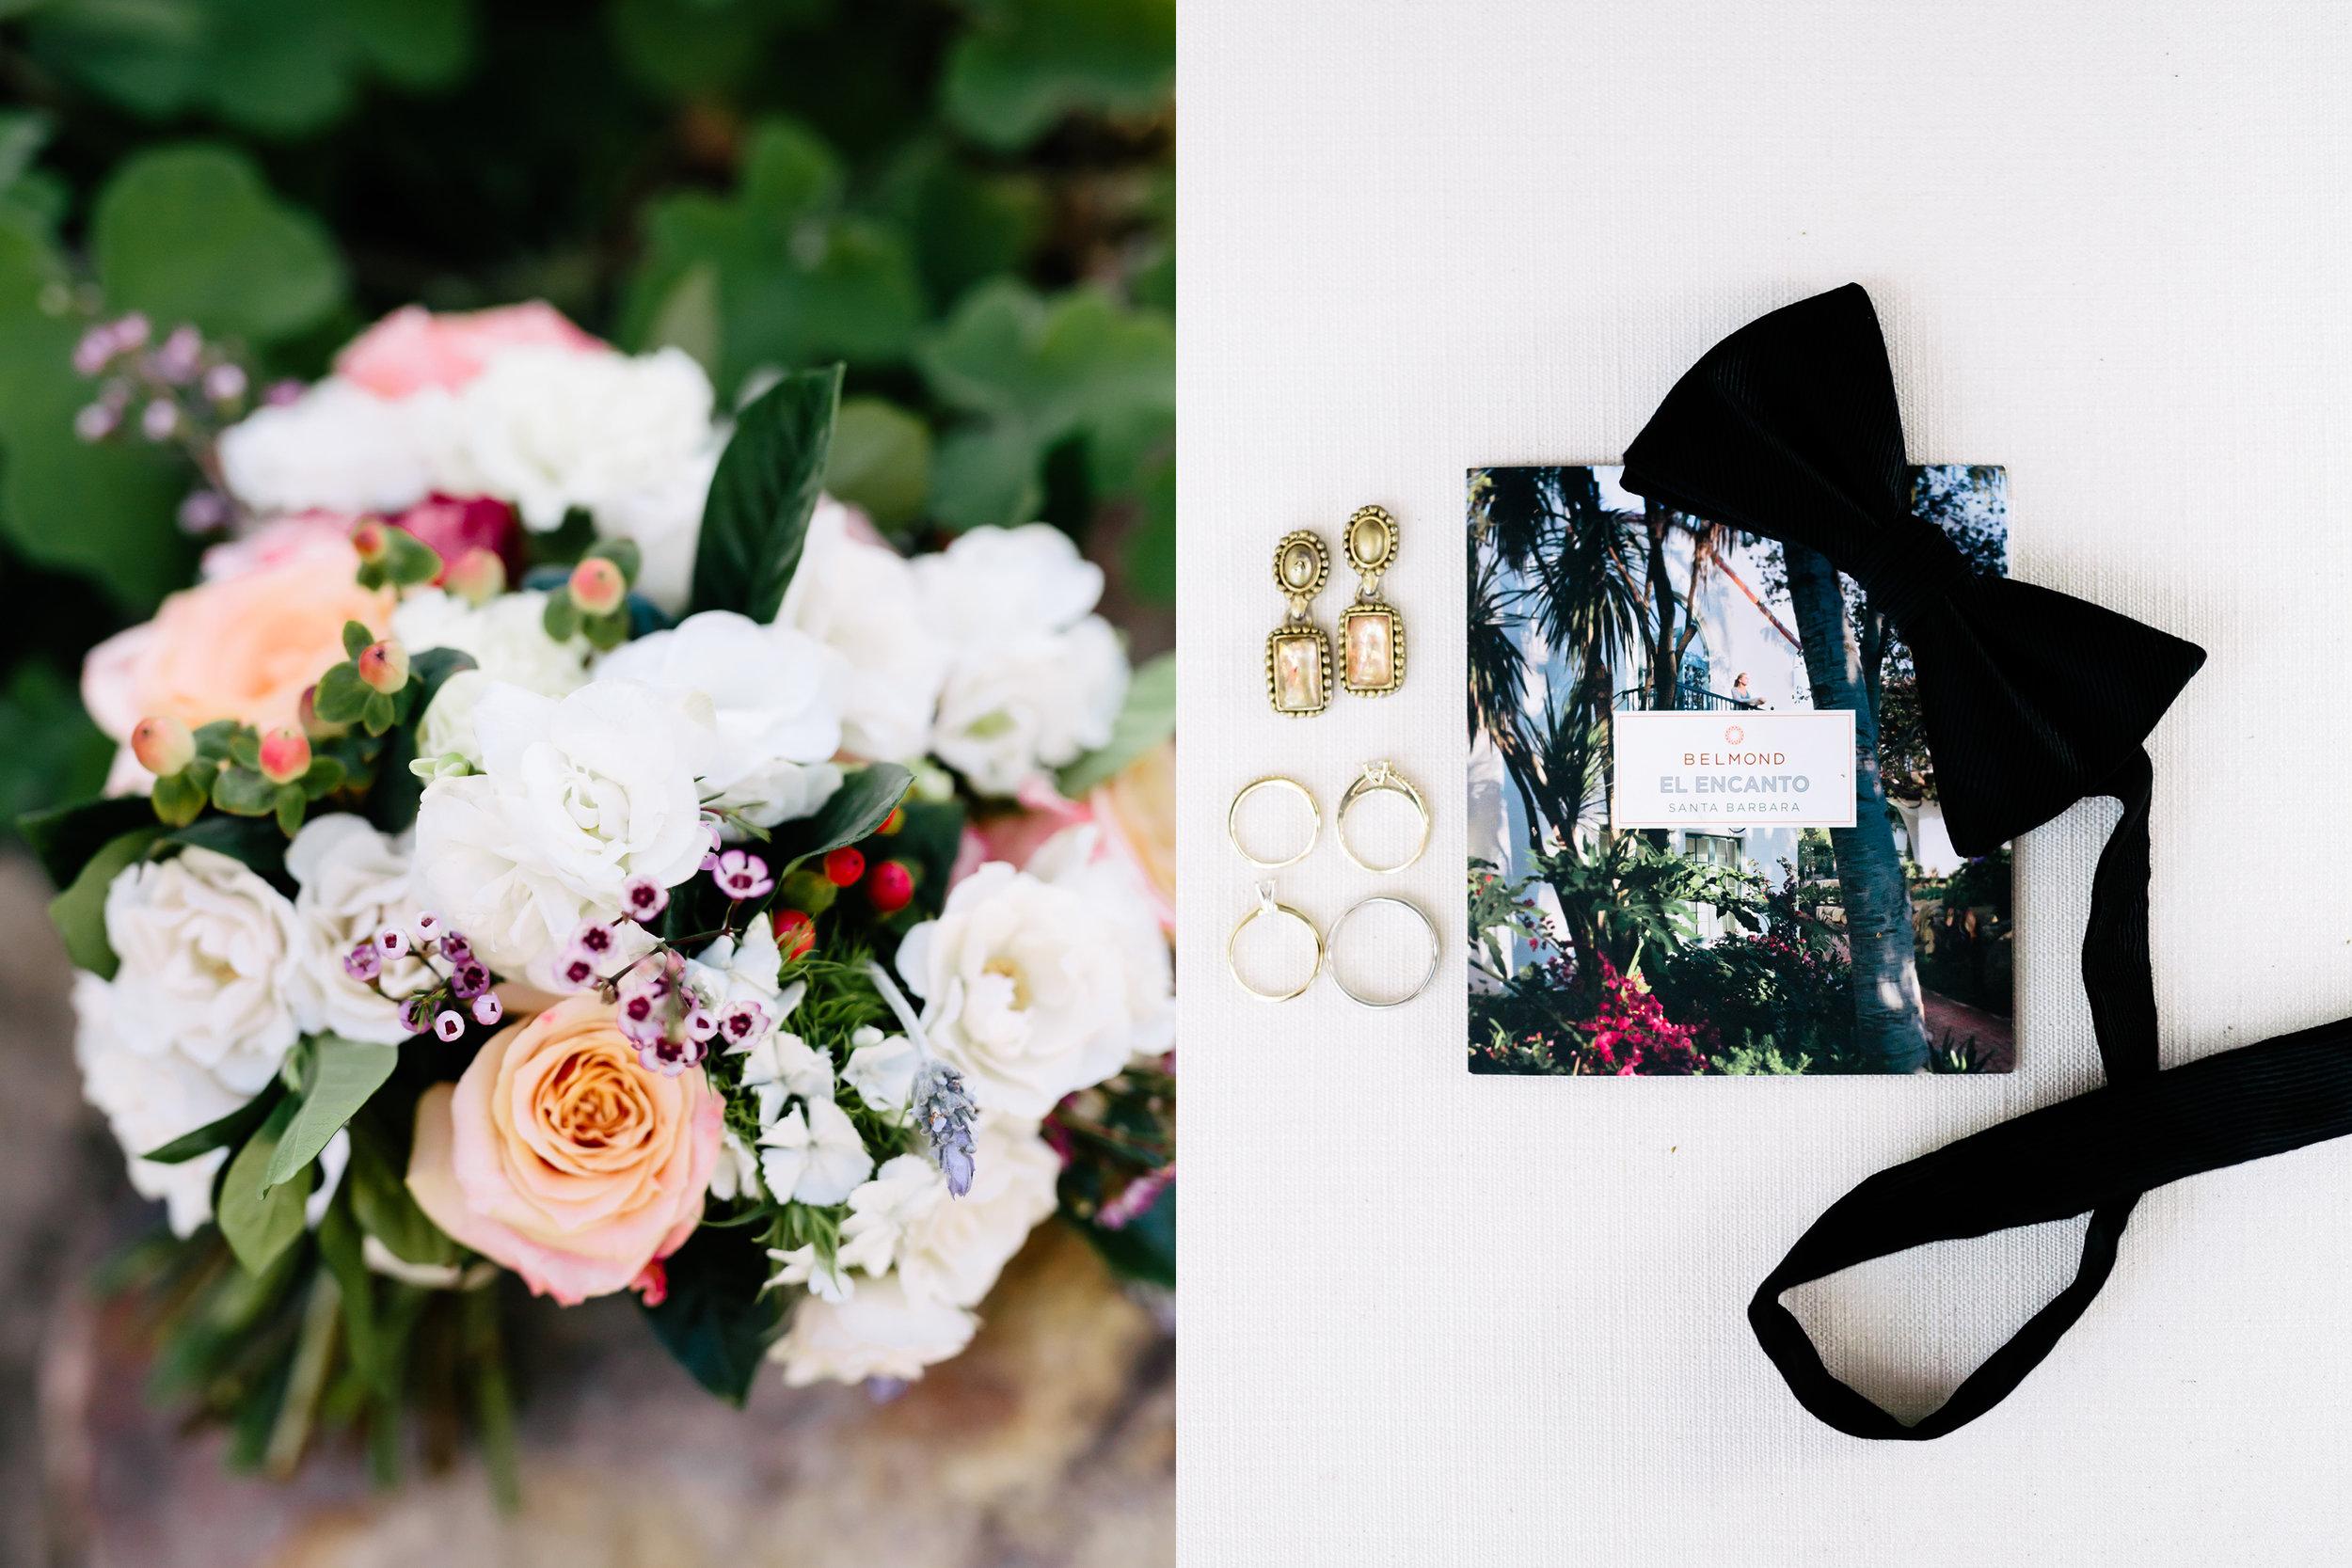 santa-barbara-elopement-wedding-planner-coordinator-day-of-el-encanto-belmond-resort-elope-lily-pond-black-tie-riviera (3).jpg